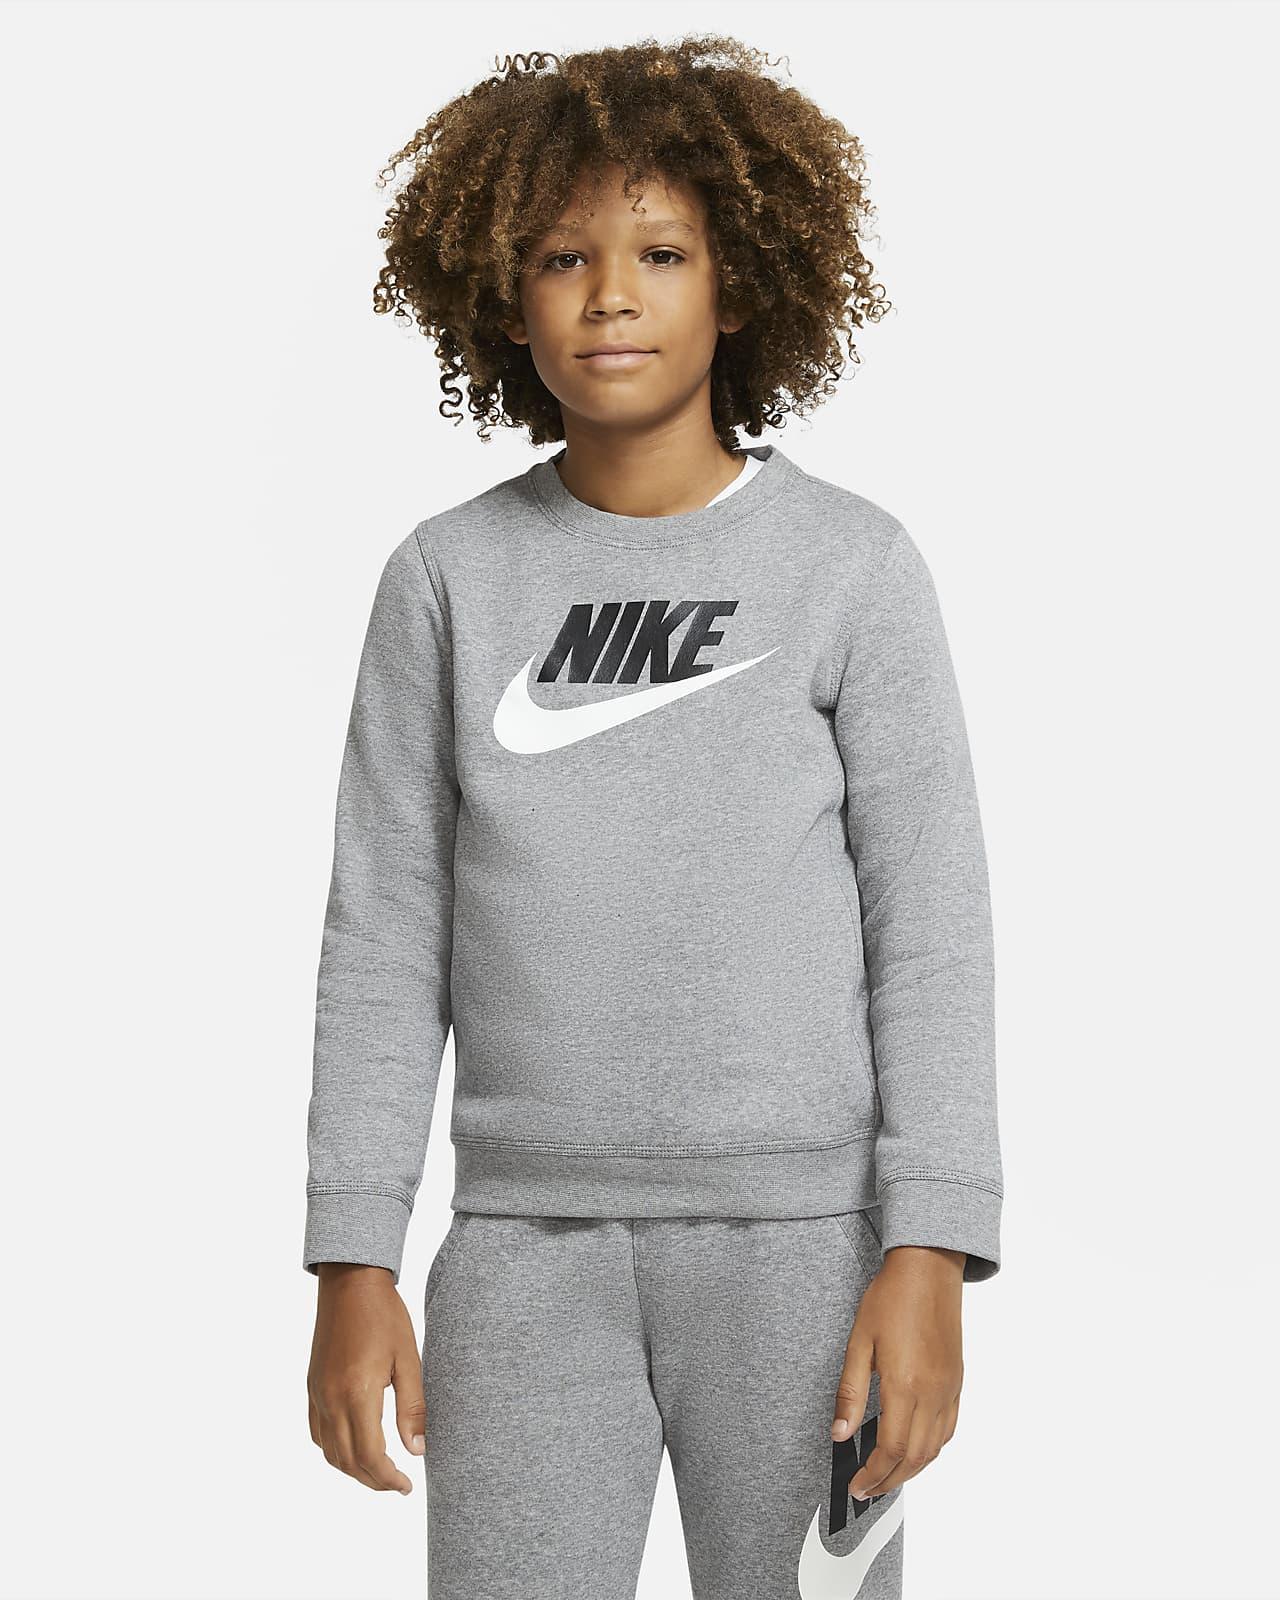 Свитшот для мальчиков школьного возраста Nike Sportswear Club Fleece